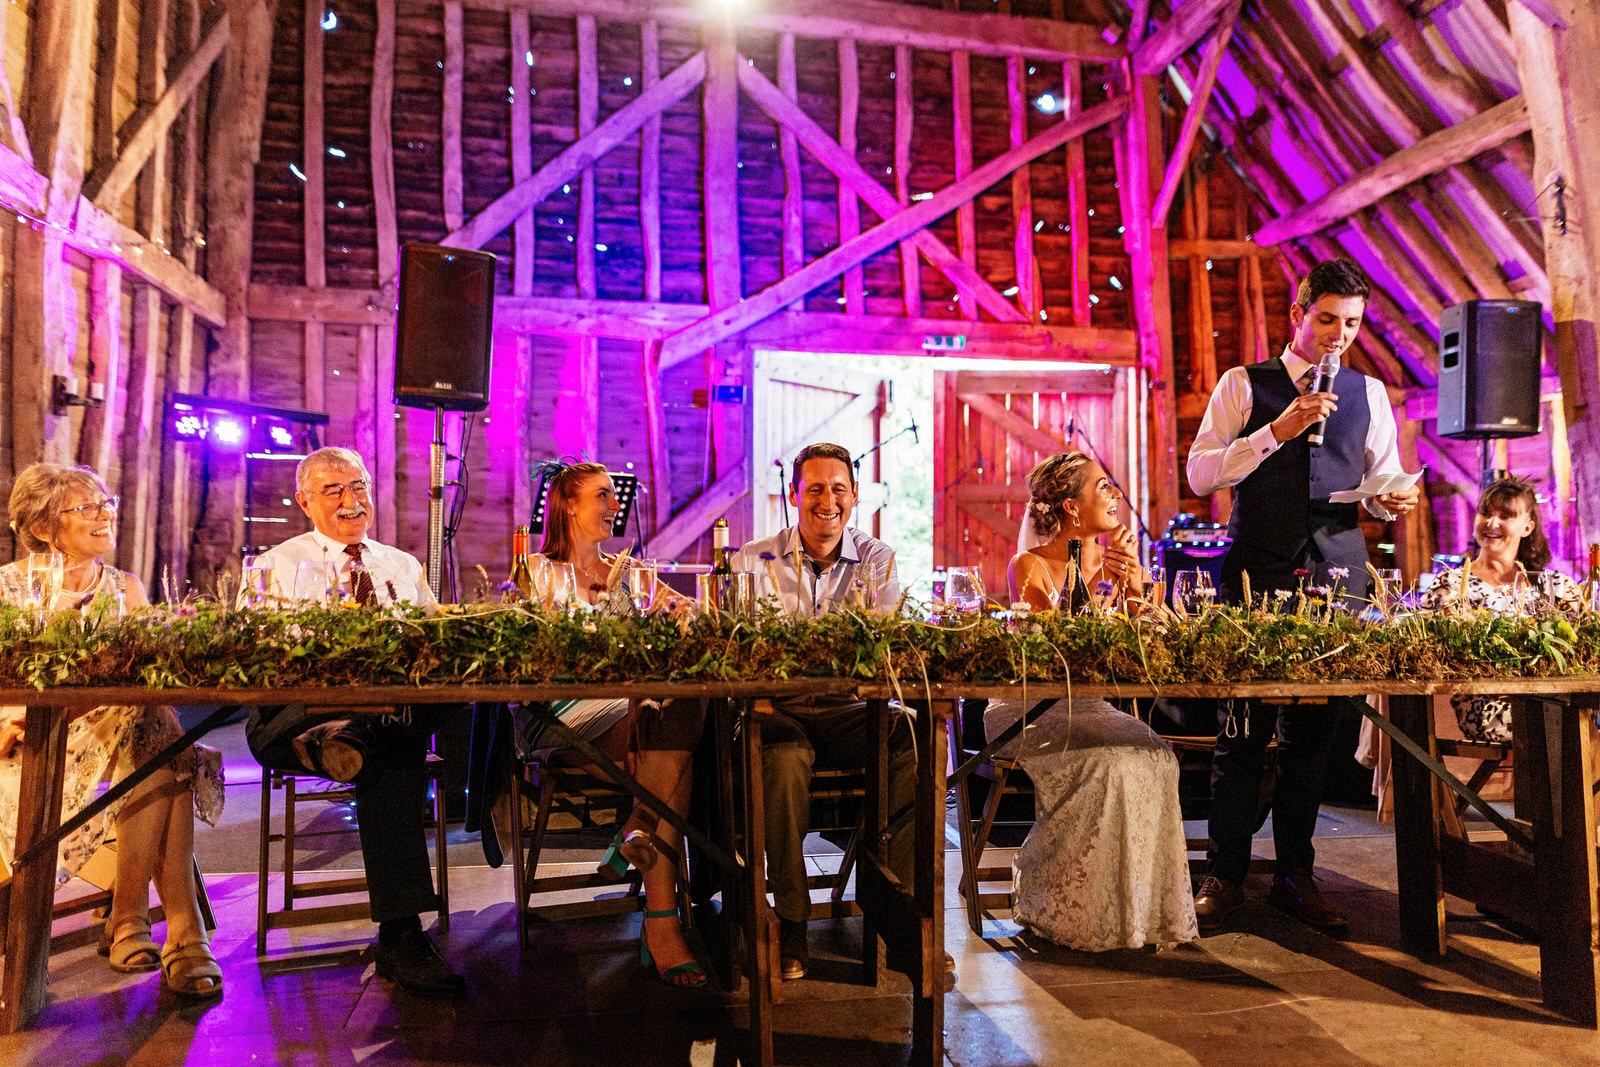 Edworth-Manor-Farm-Wedding-Photographer-059.jpg